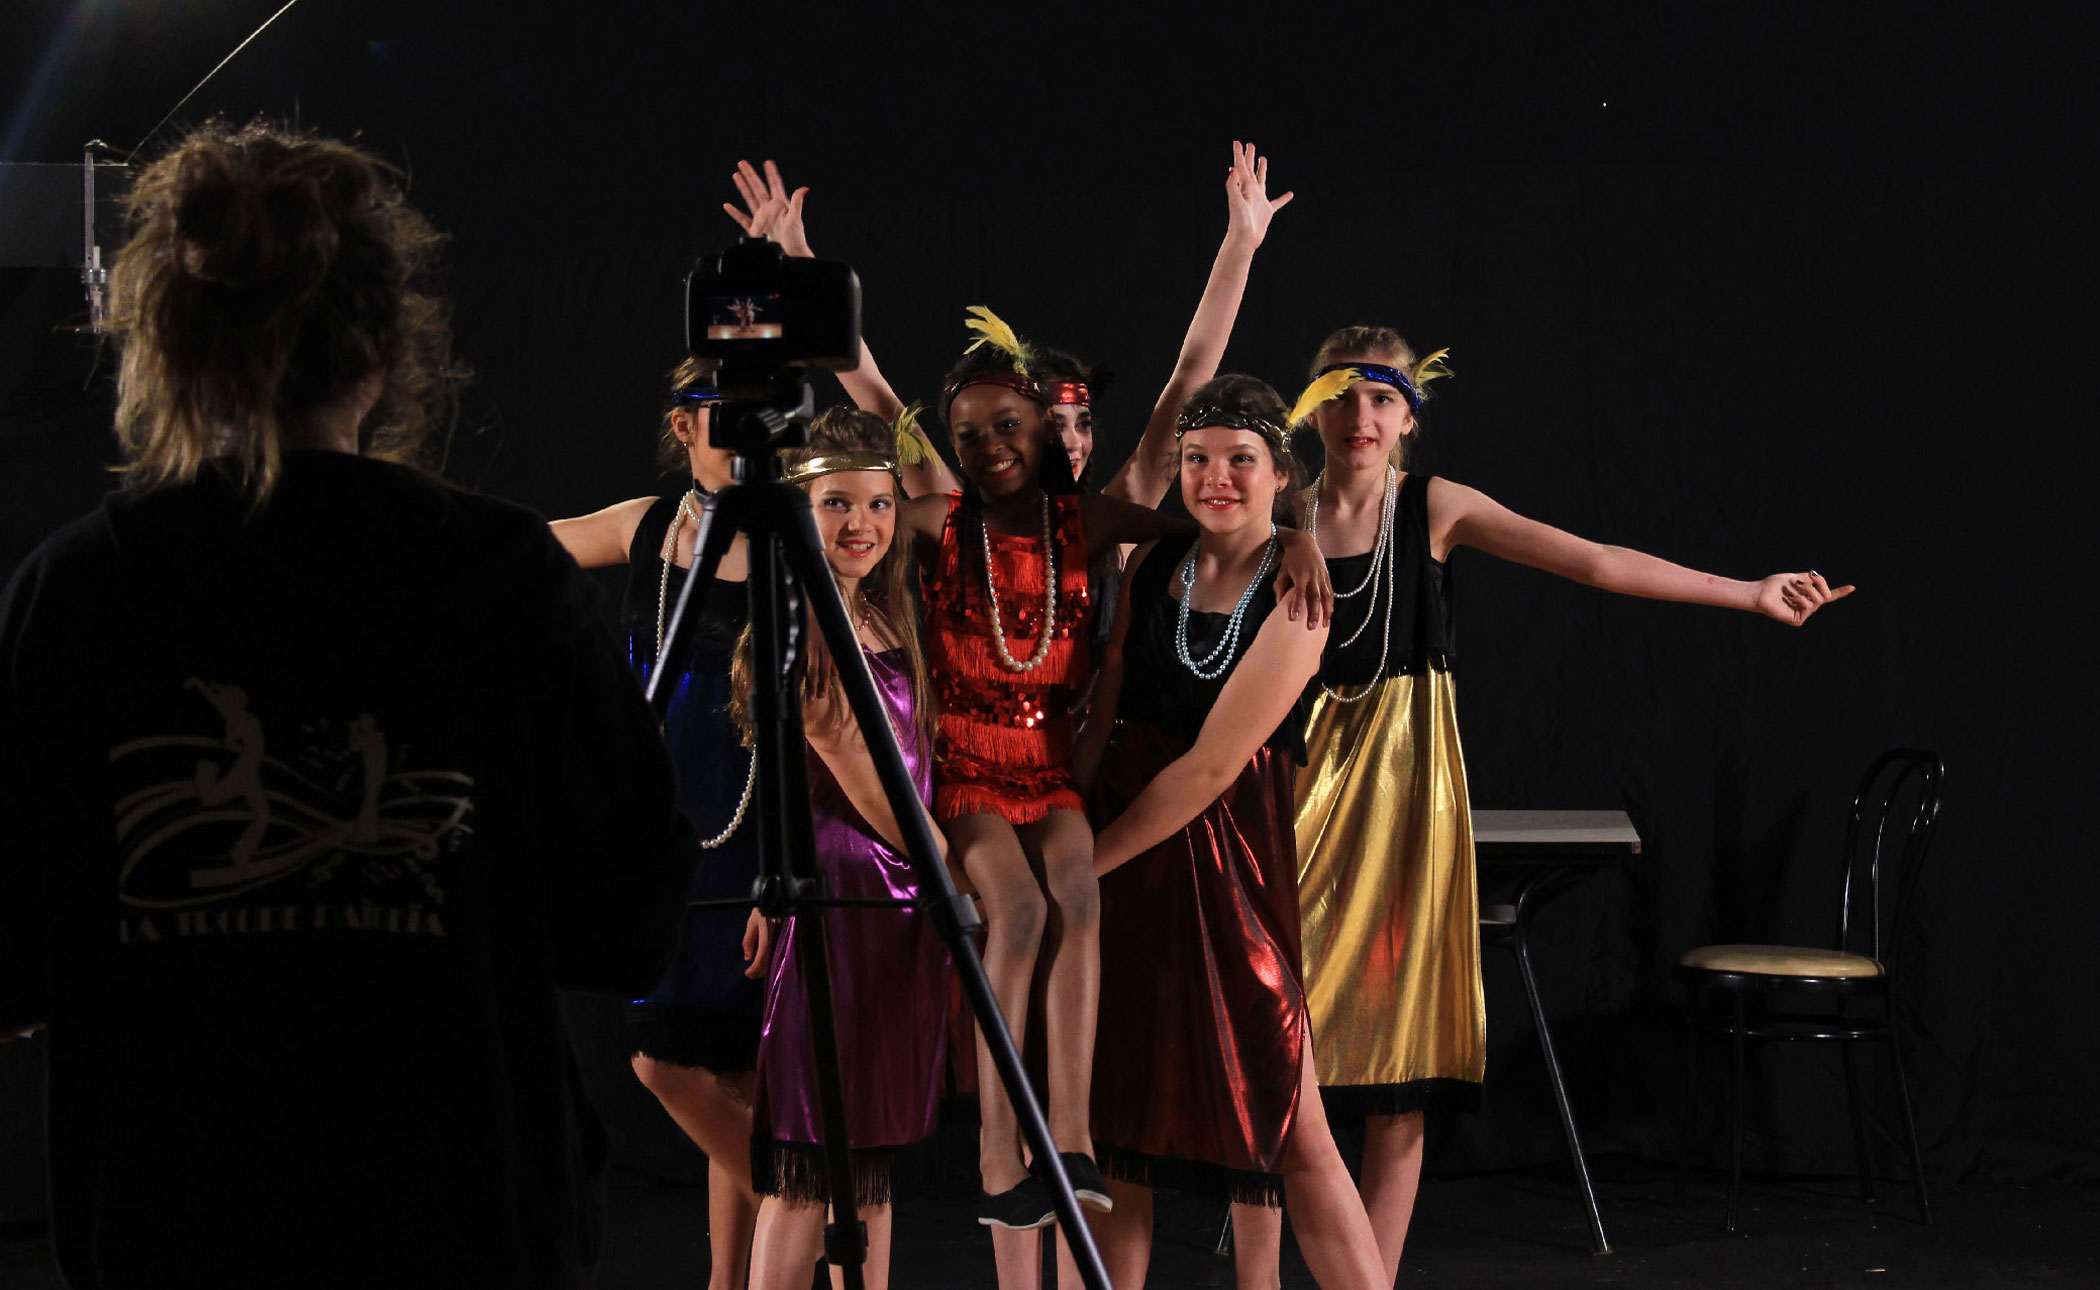 tournage enfants cabaret charleston musical